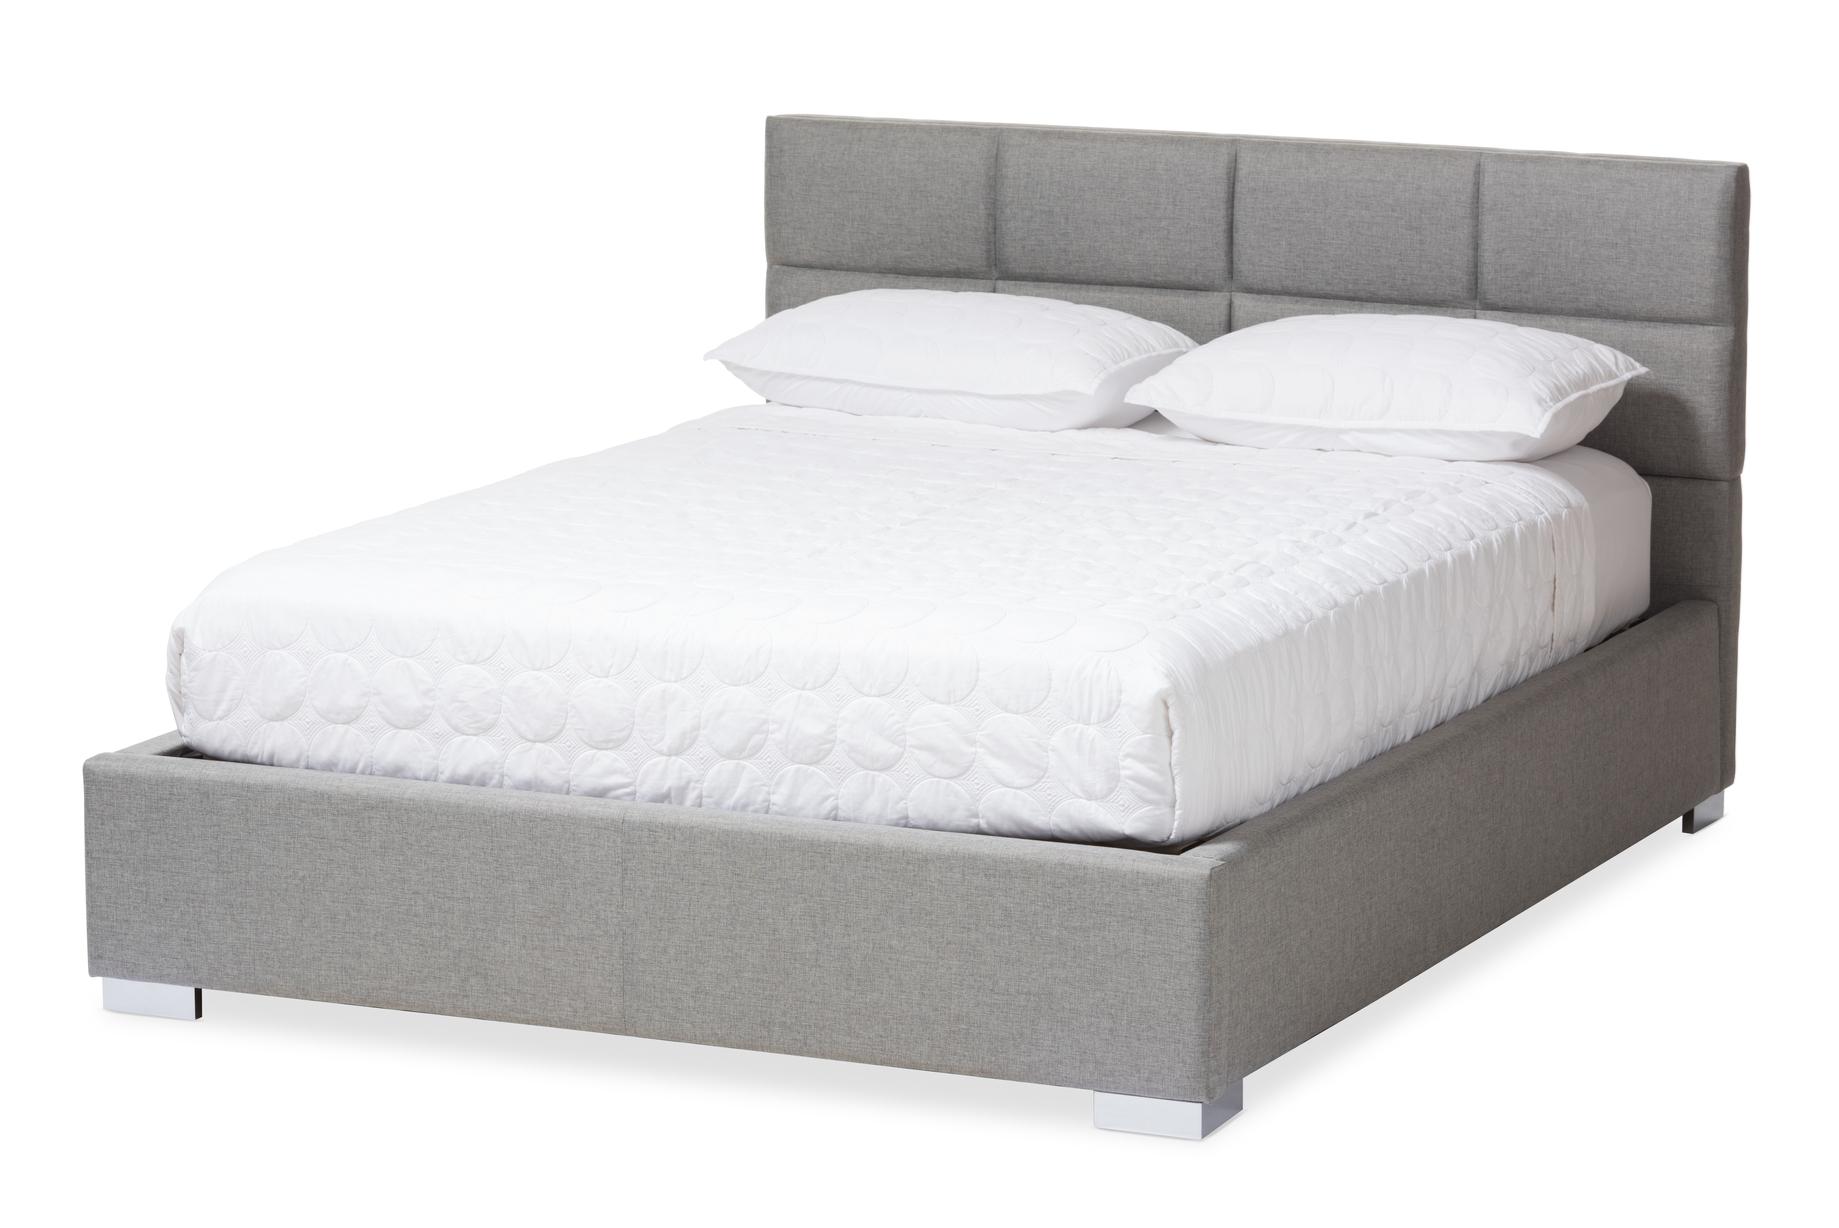 gray beds size depot gry queen the altozzo manhattan platform home wood p headboards alt bed